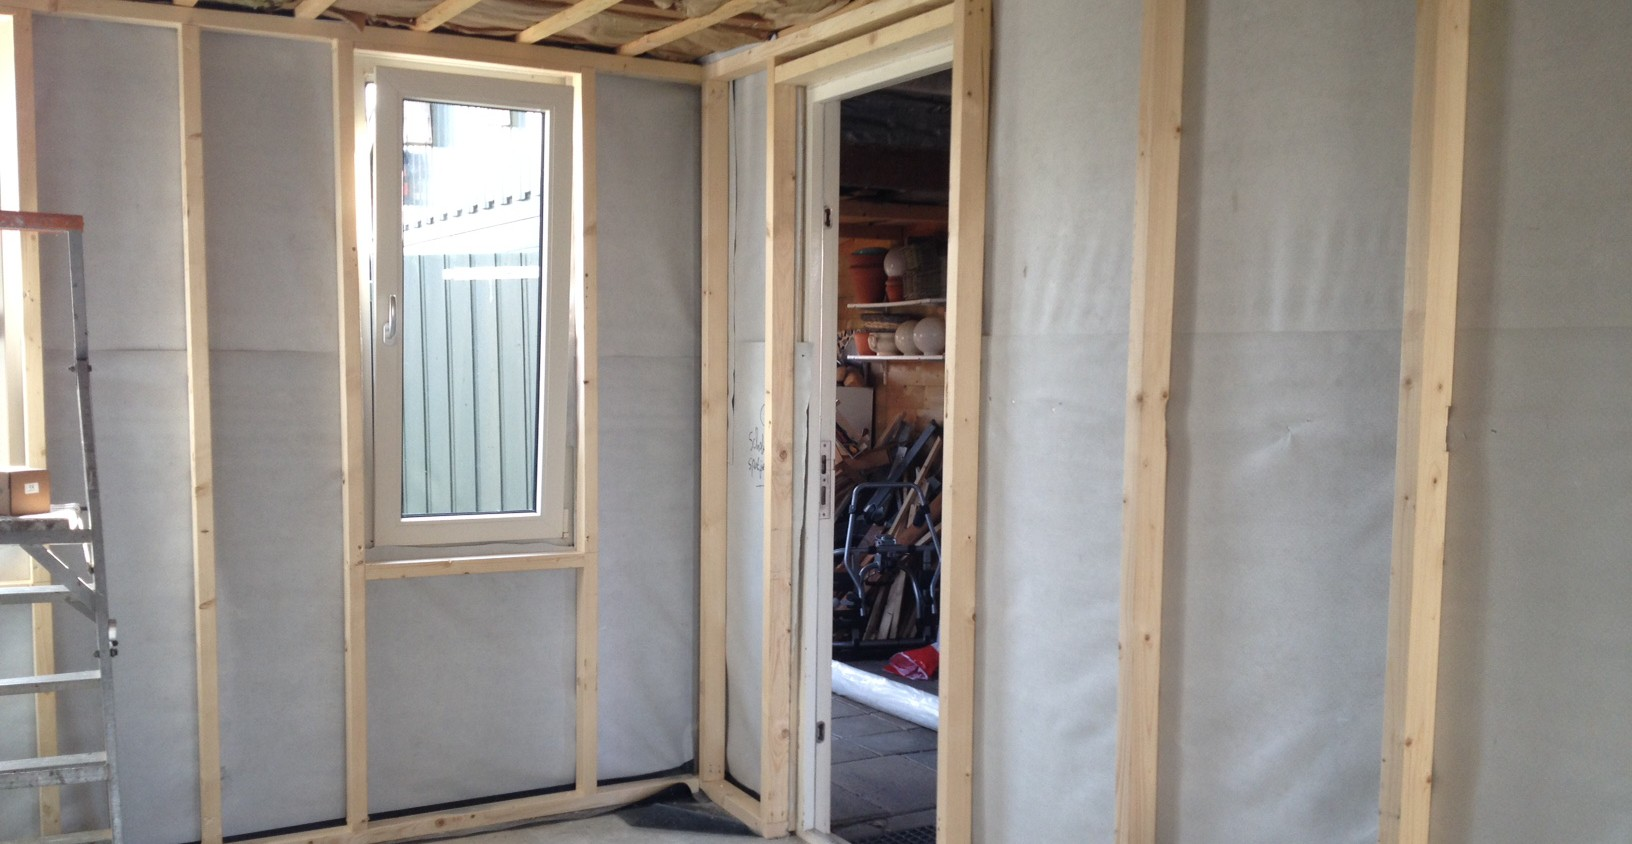 Extra Kamer Maken : Berging wordt extra kamer witmarsum 2015 hofstra bouw